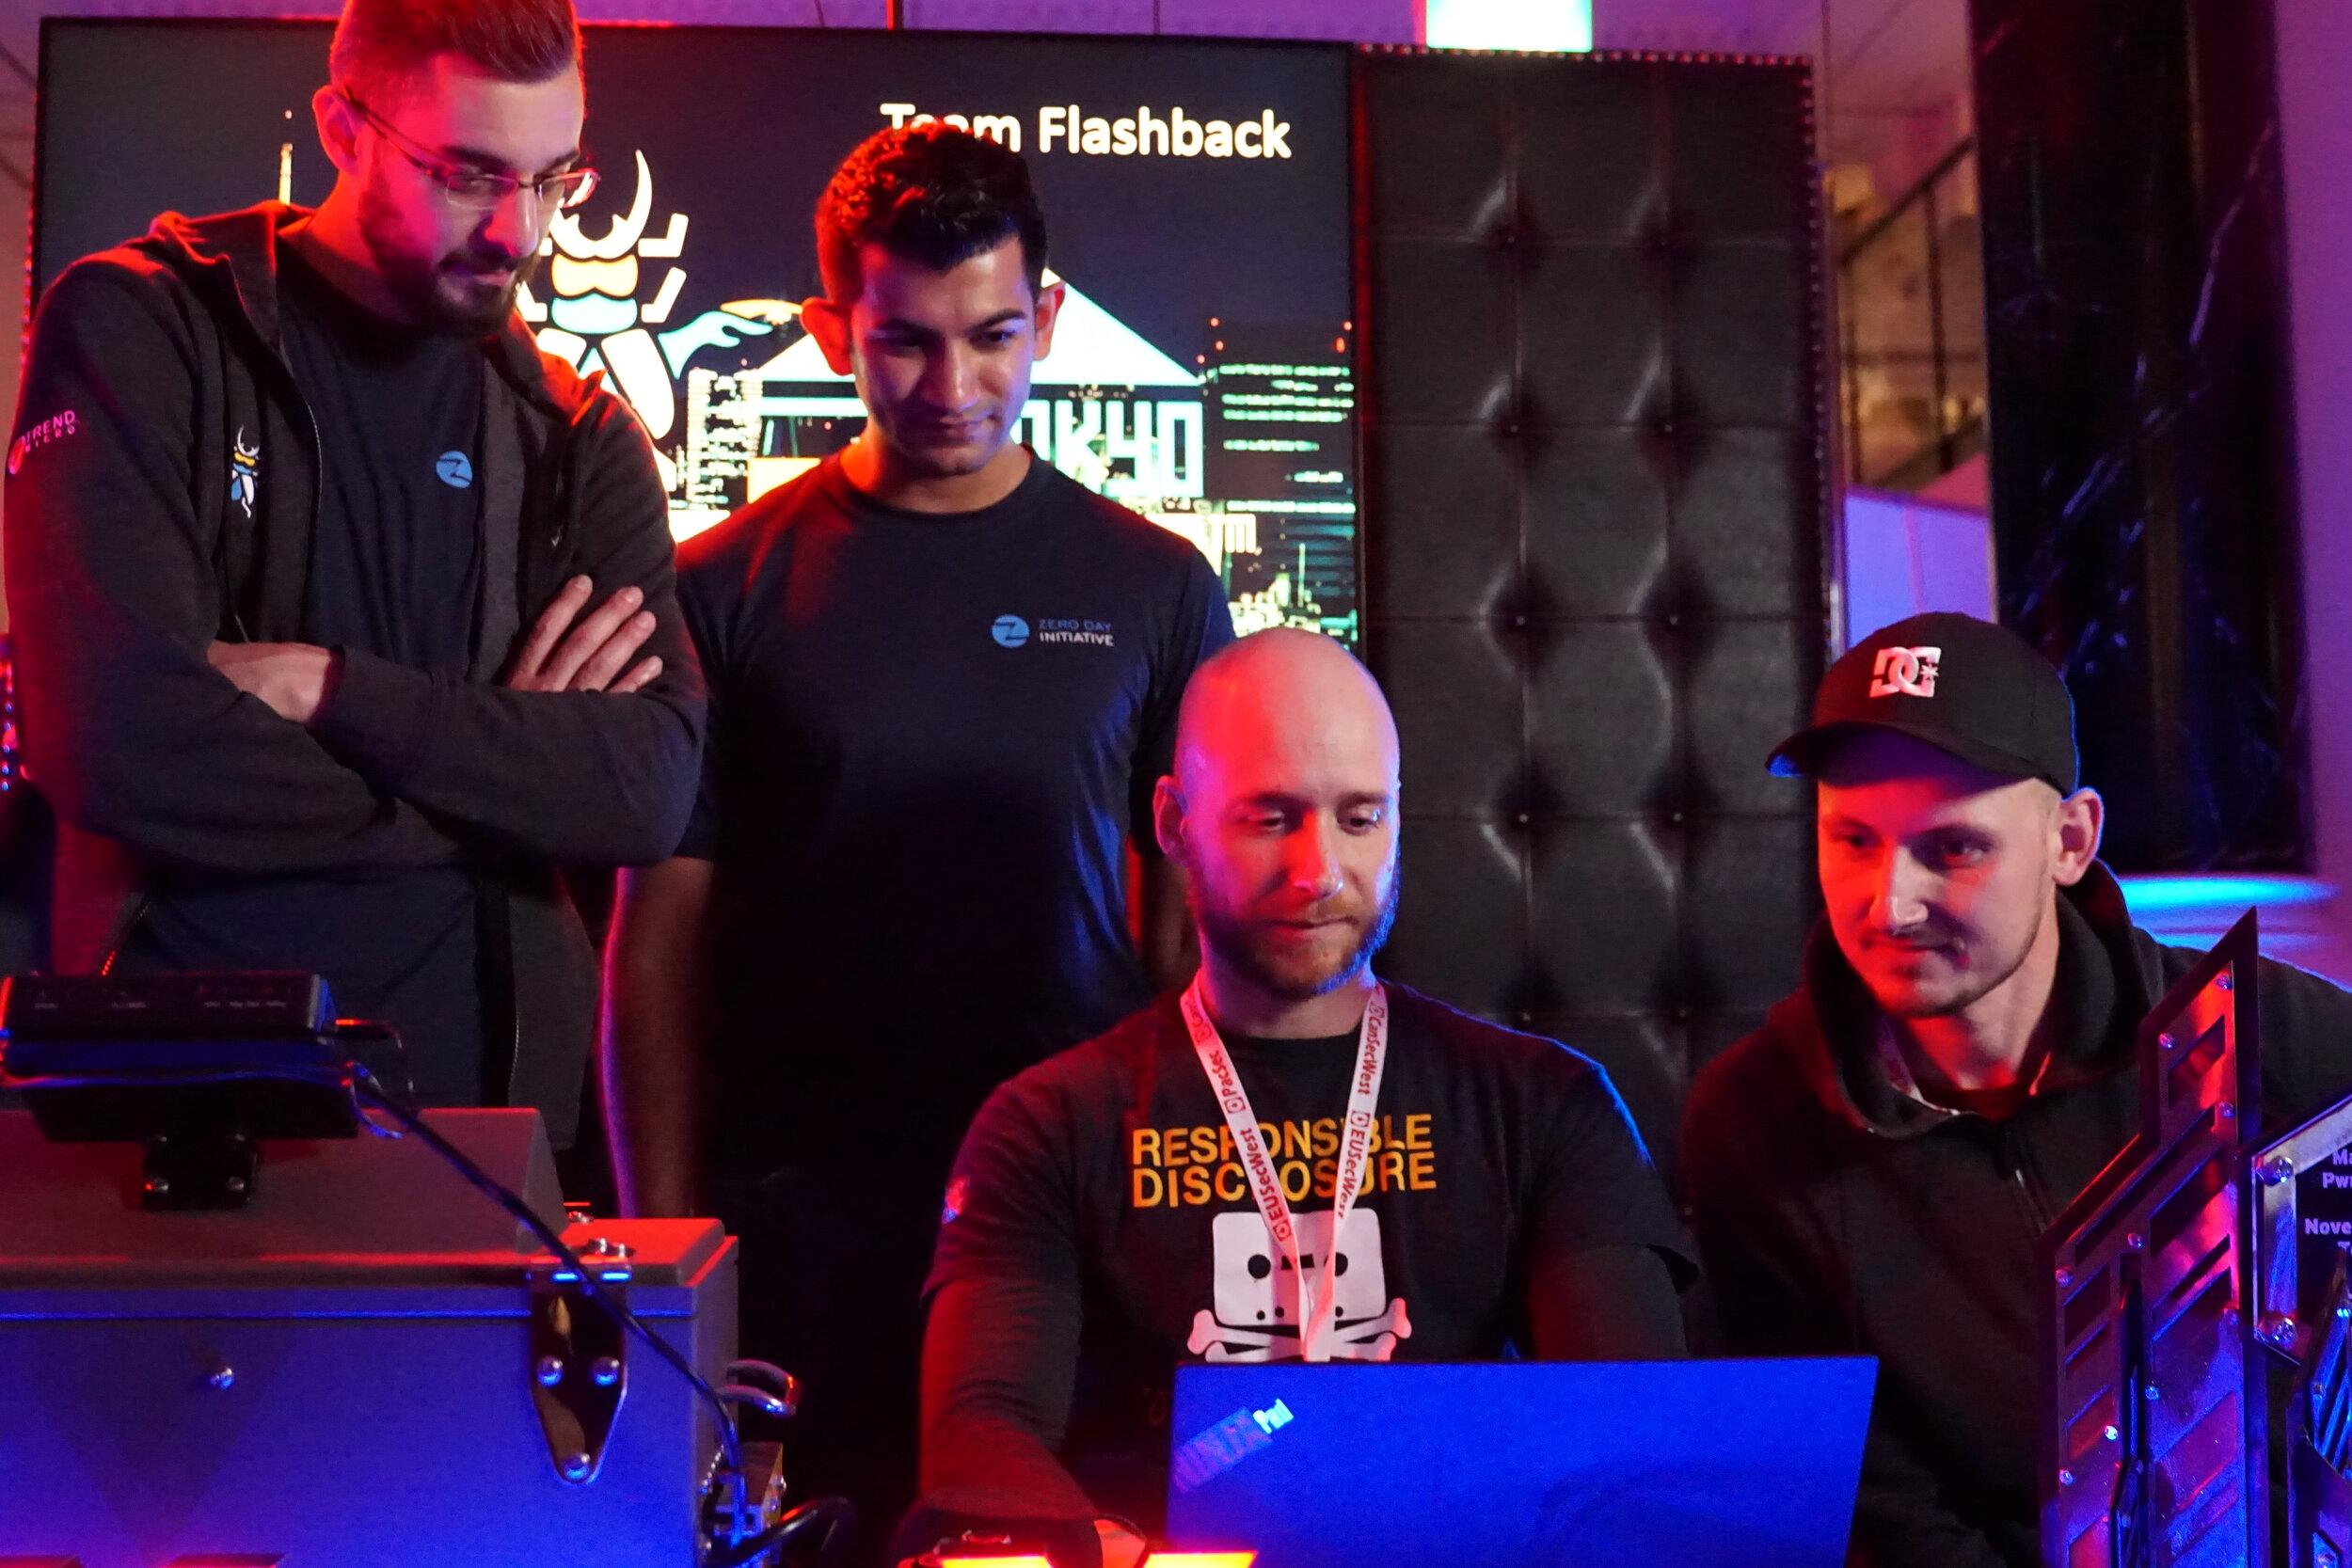 ZDI's Abdul-Aziz Hariri and Jasiel Spelman observe Pedro Ribeiro and Radek Domanski of Team Flashback